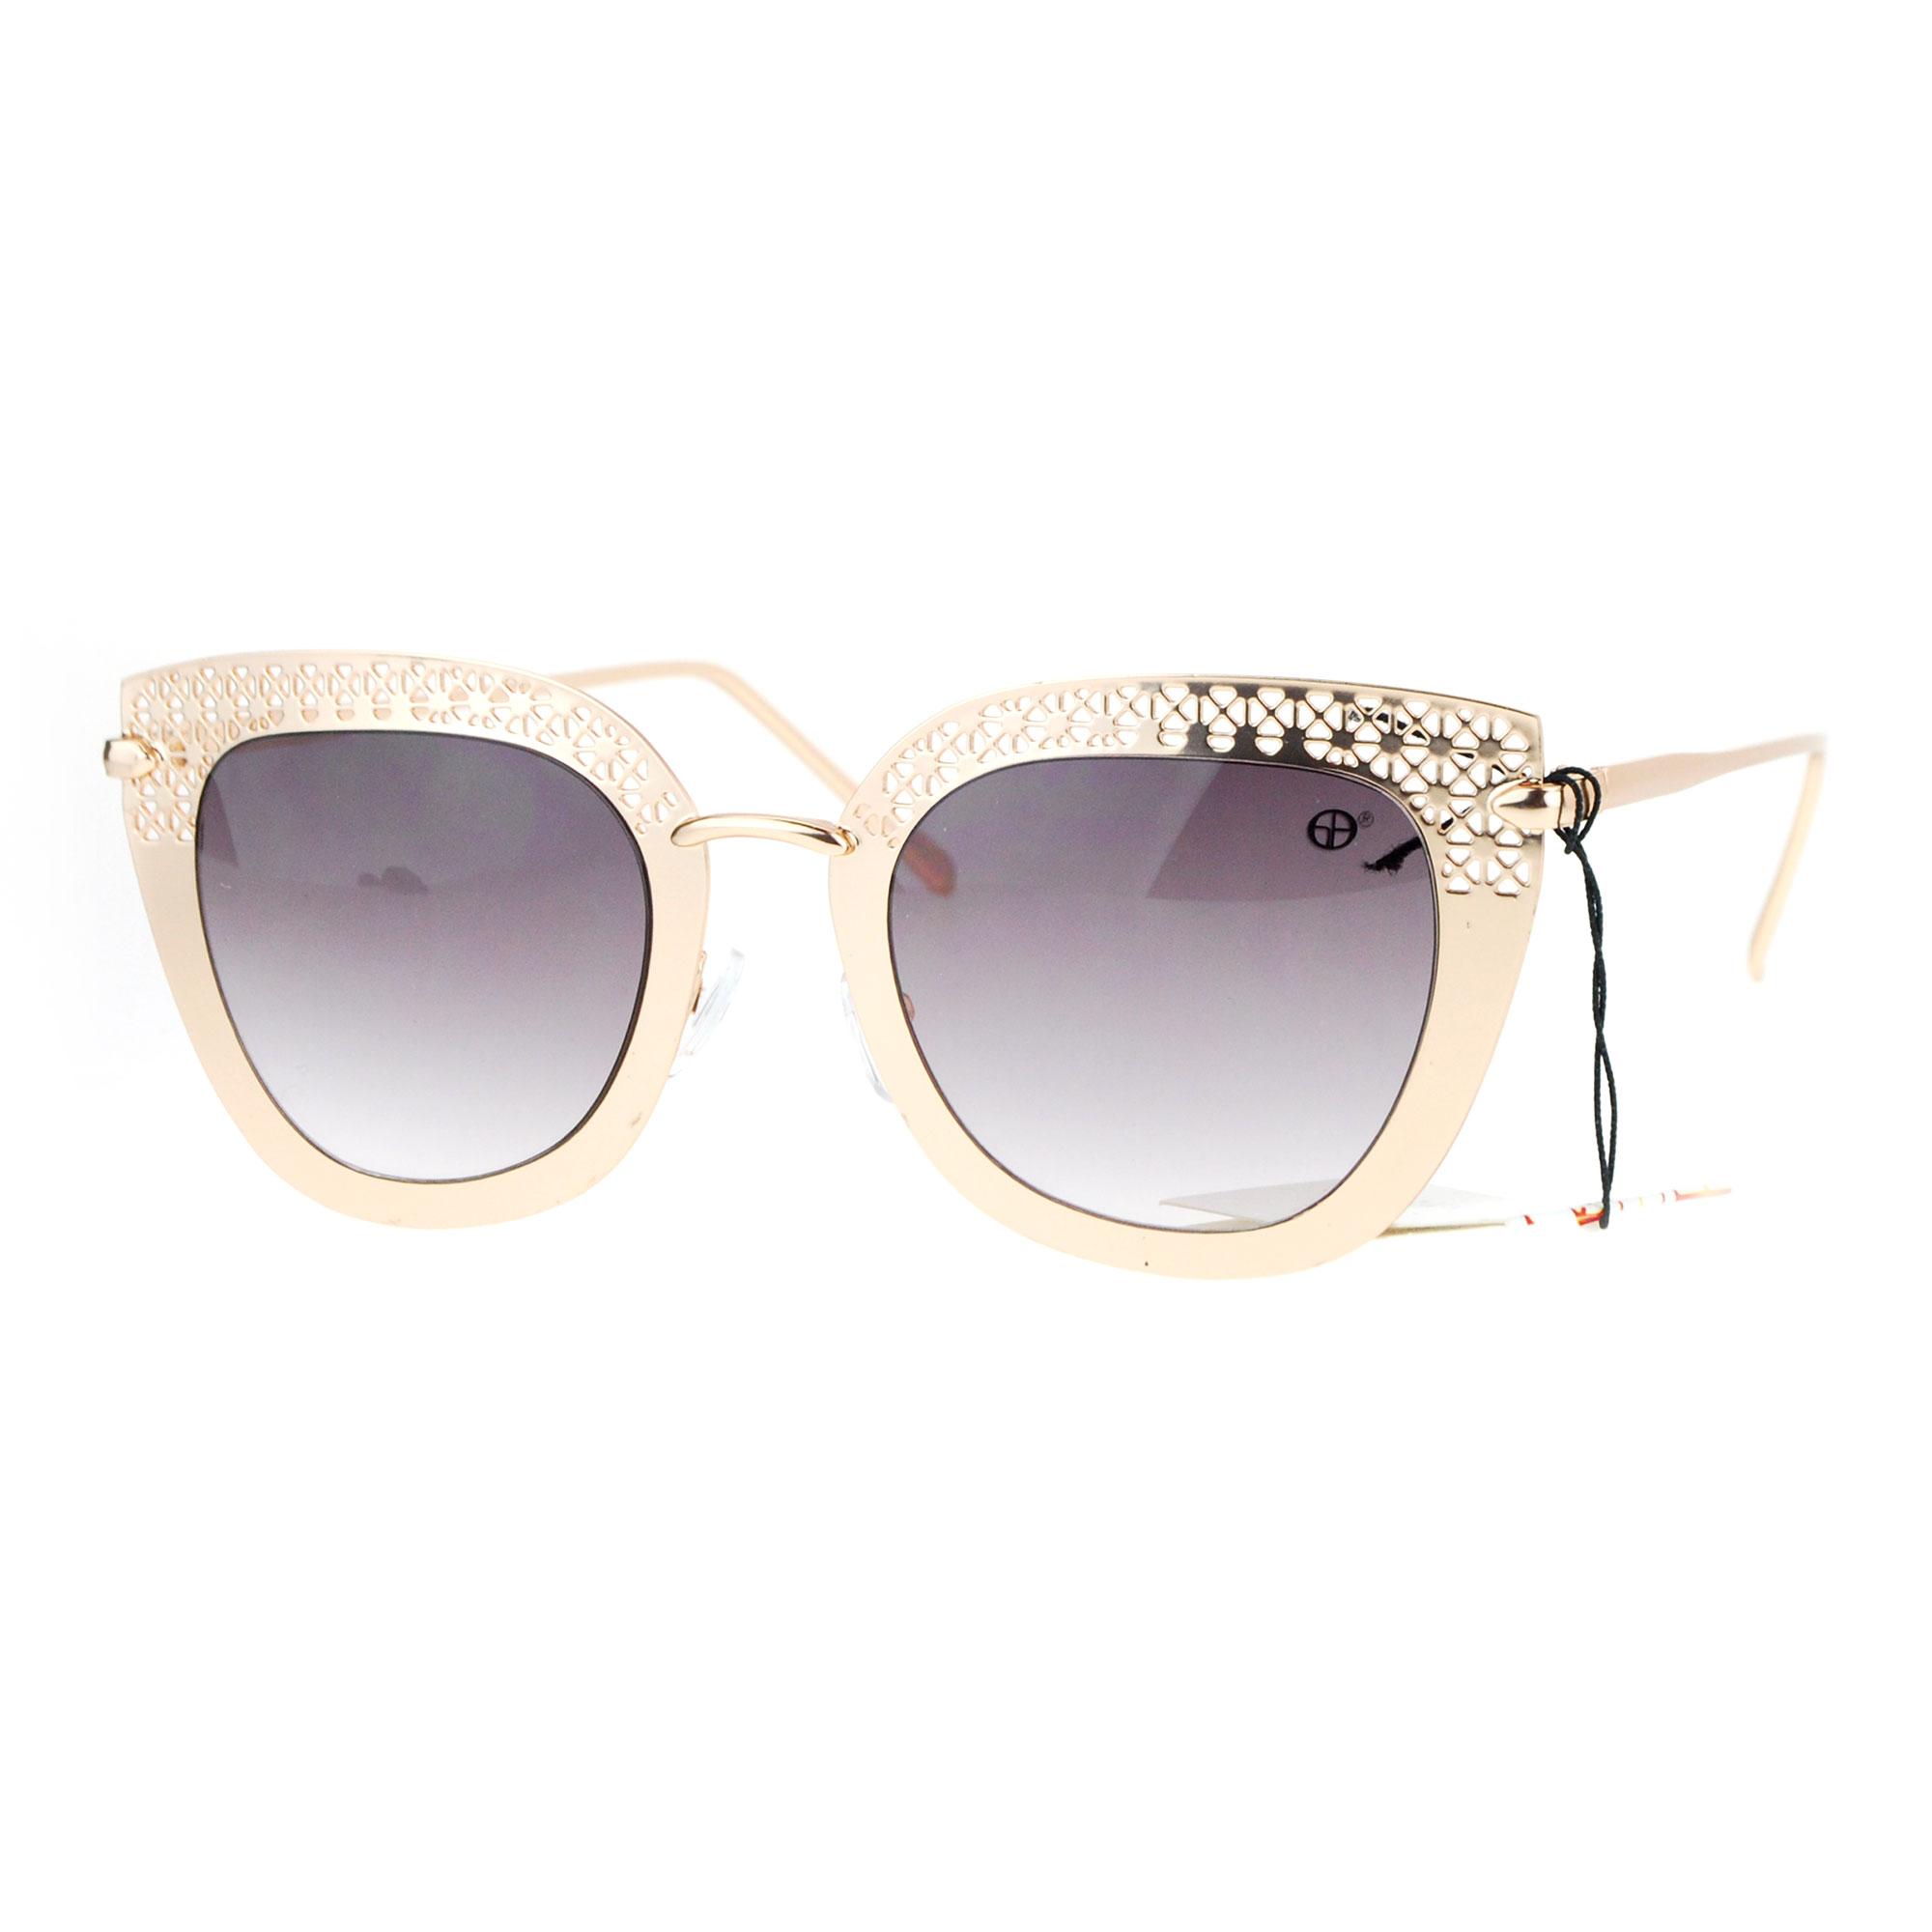 Metal Cat Eye Sunglasses  sa106 luxury womens fl cut metal brow cat eye sunglasses